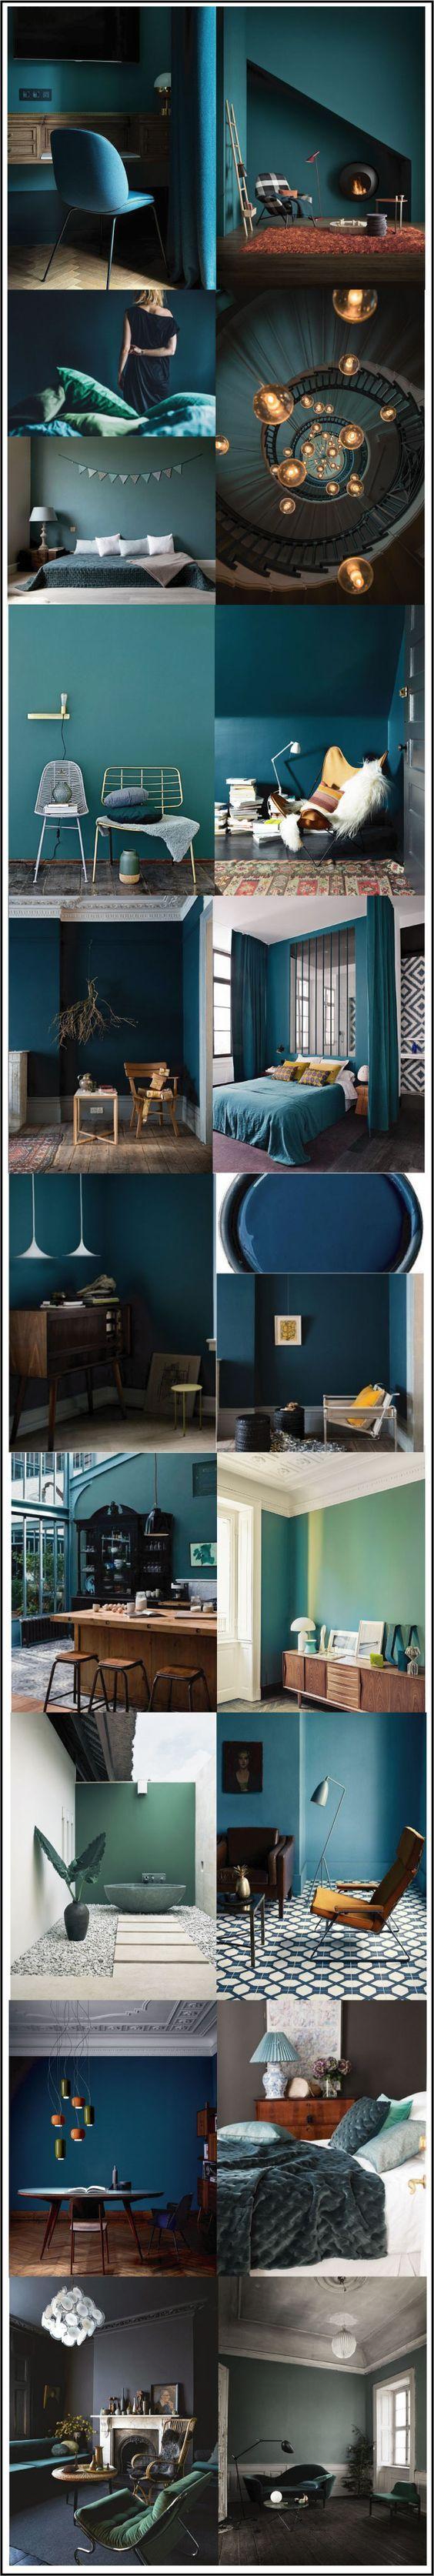 nuances de bleu vert vert balsam bleu p trole bleu. Black Bedroom Furniture Sets. Home Design Ideas